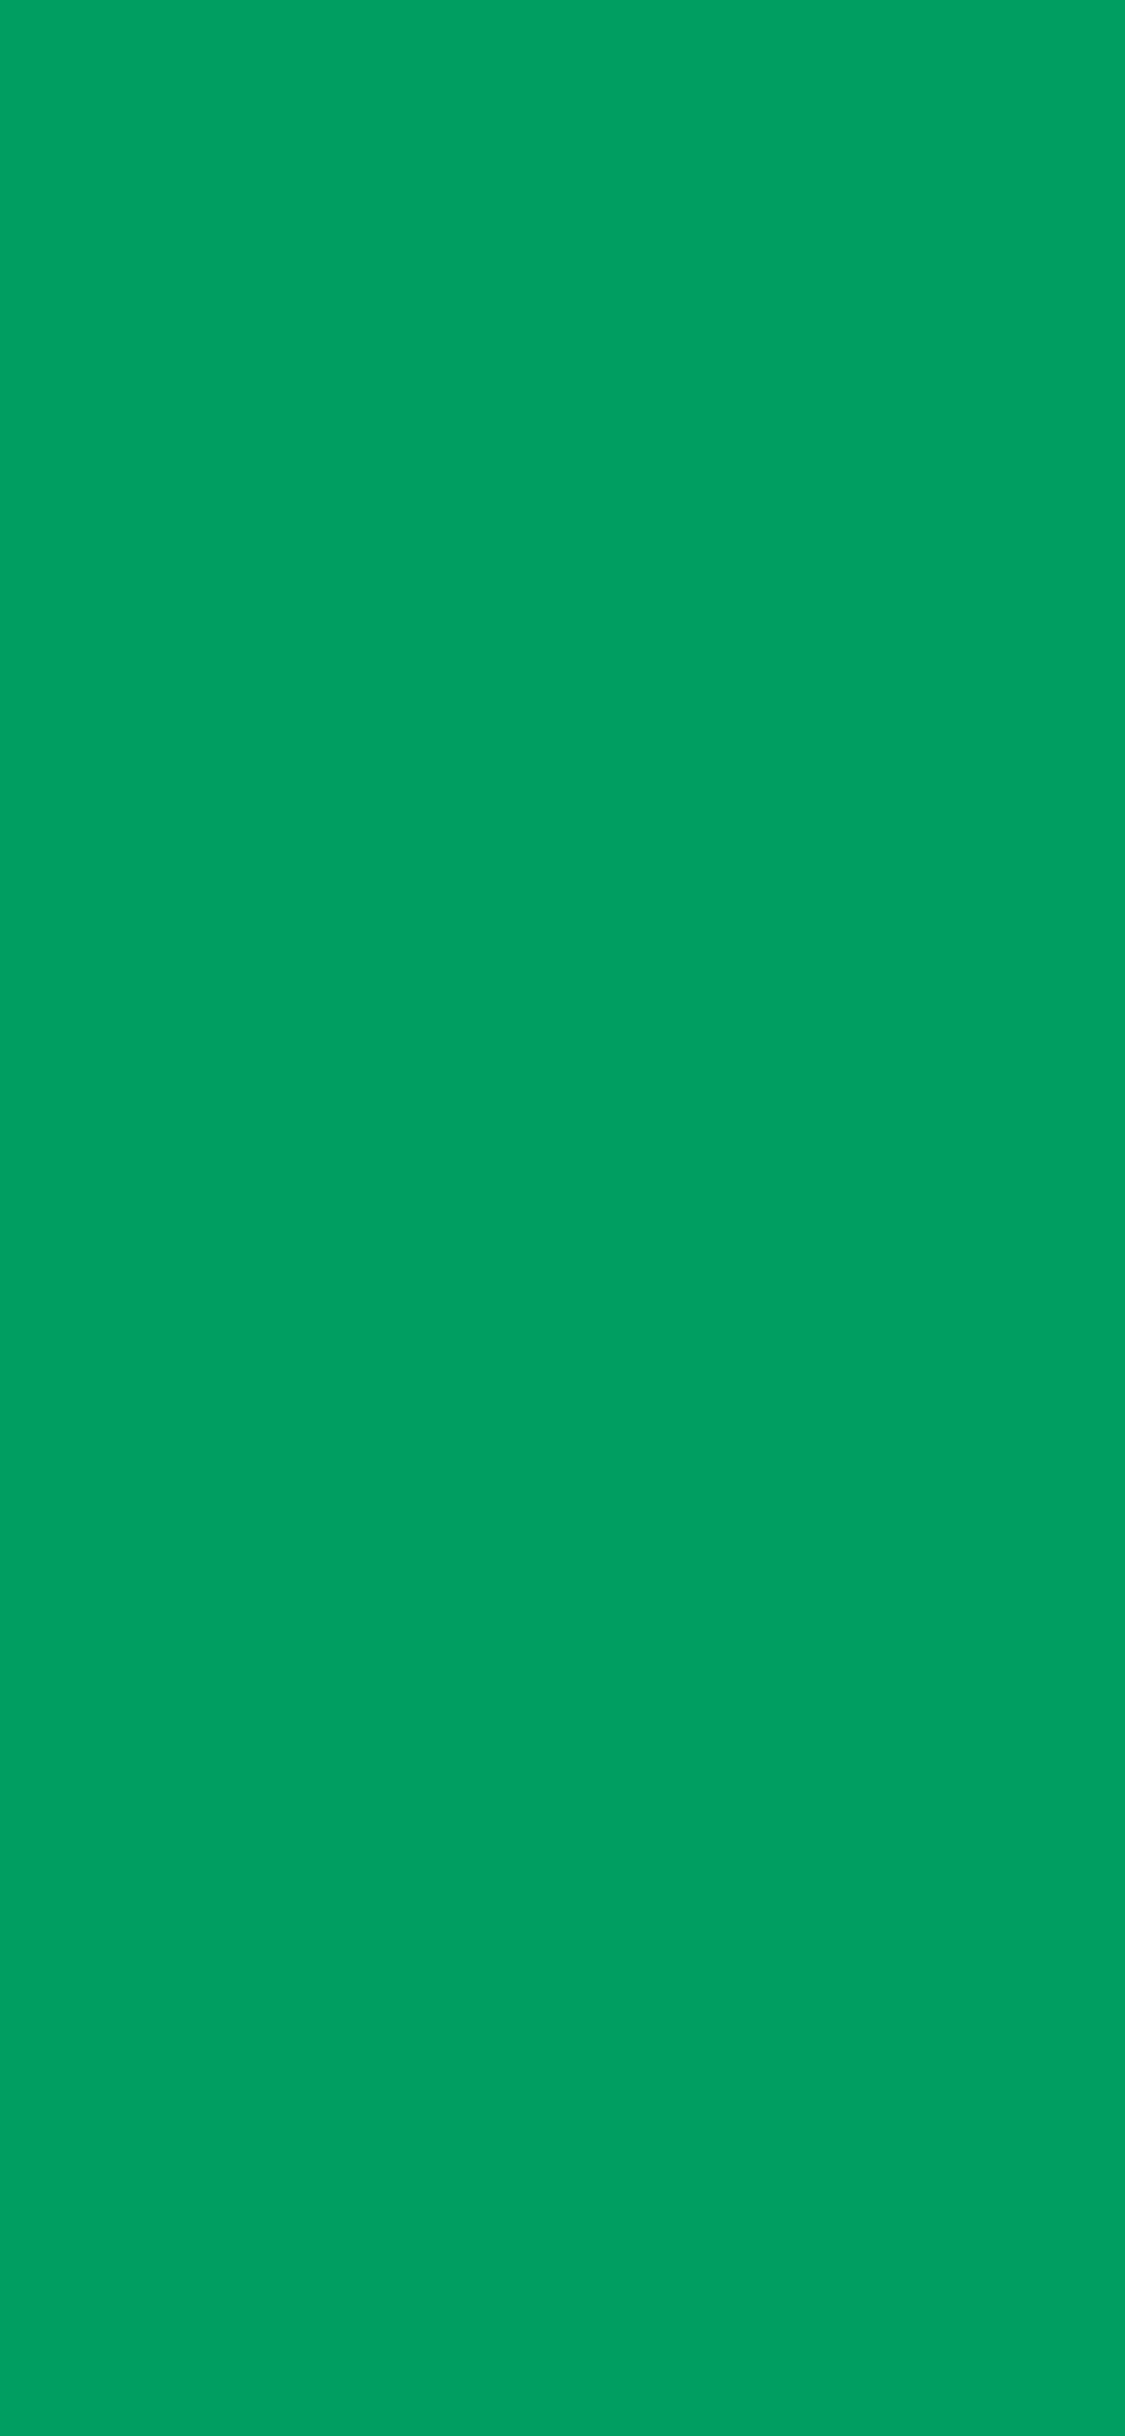 1125x2436 Shamrock Green Solid Color Background